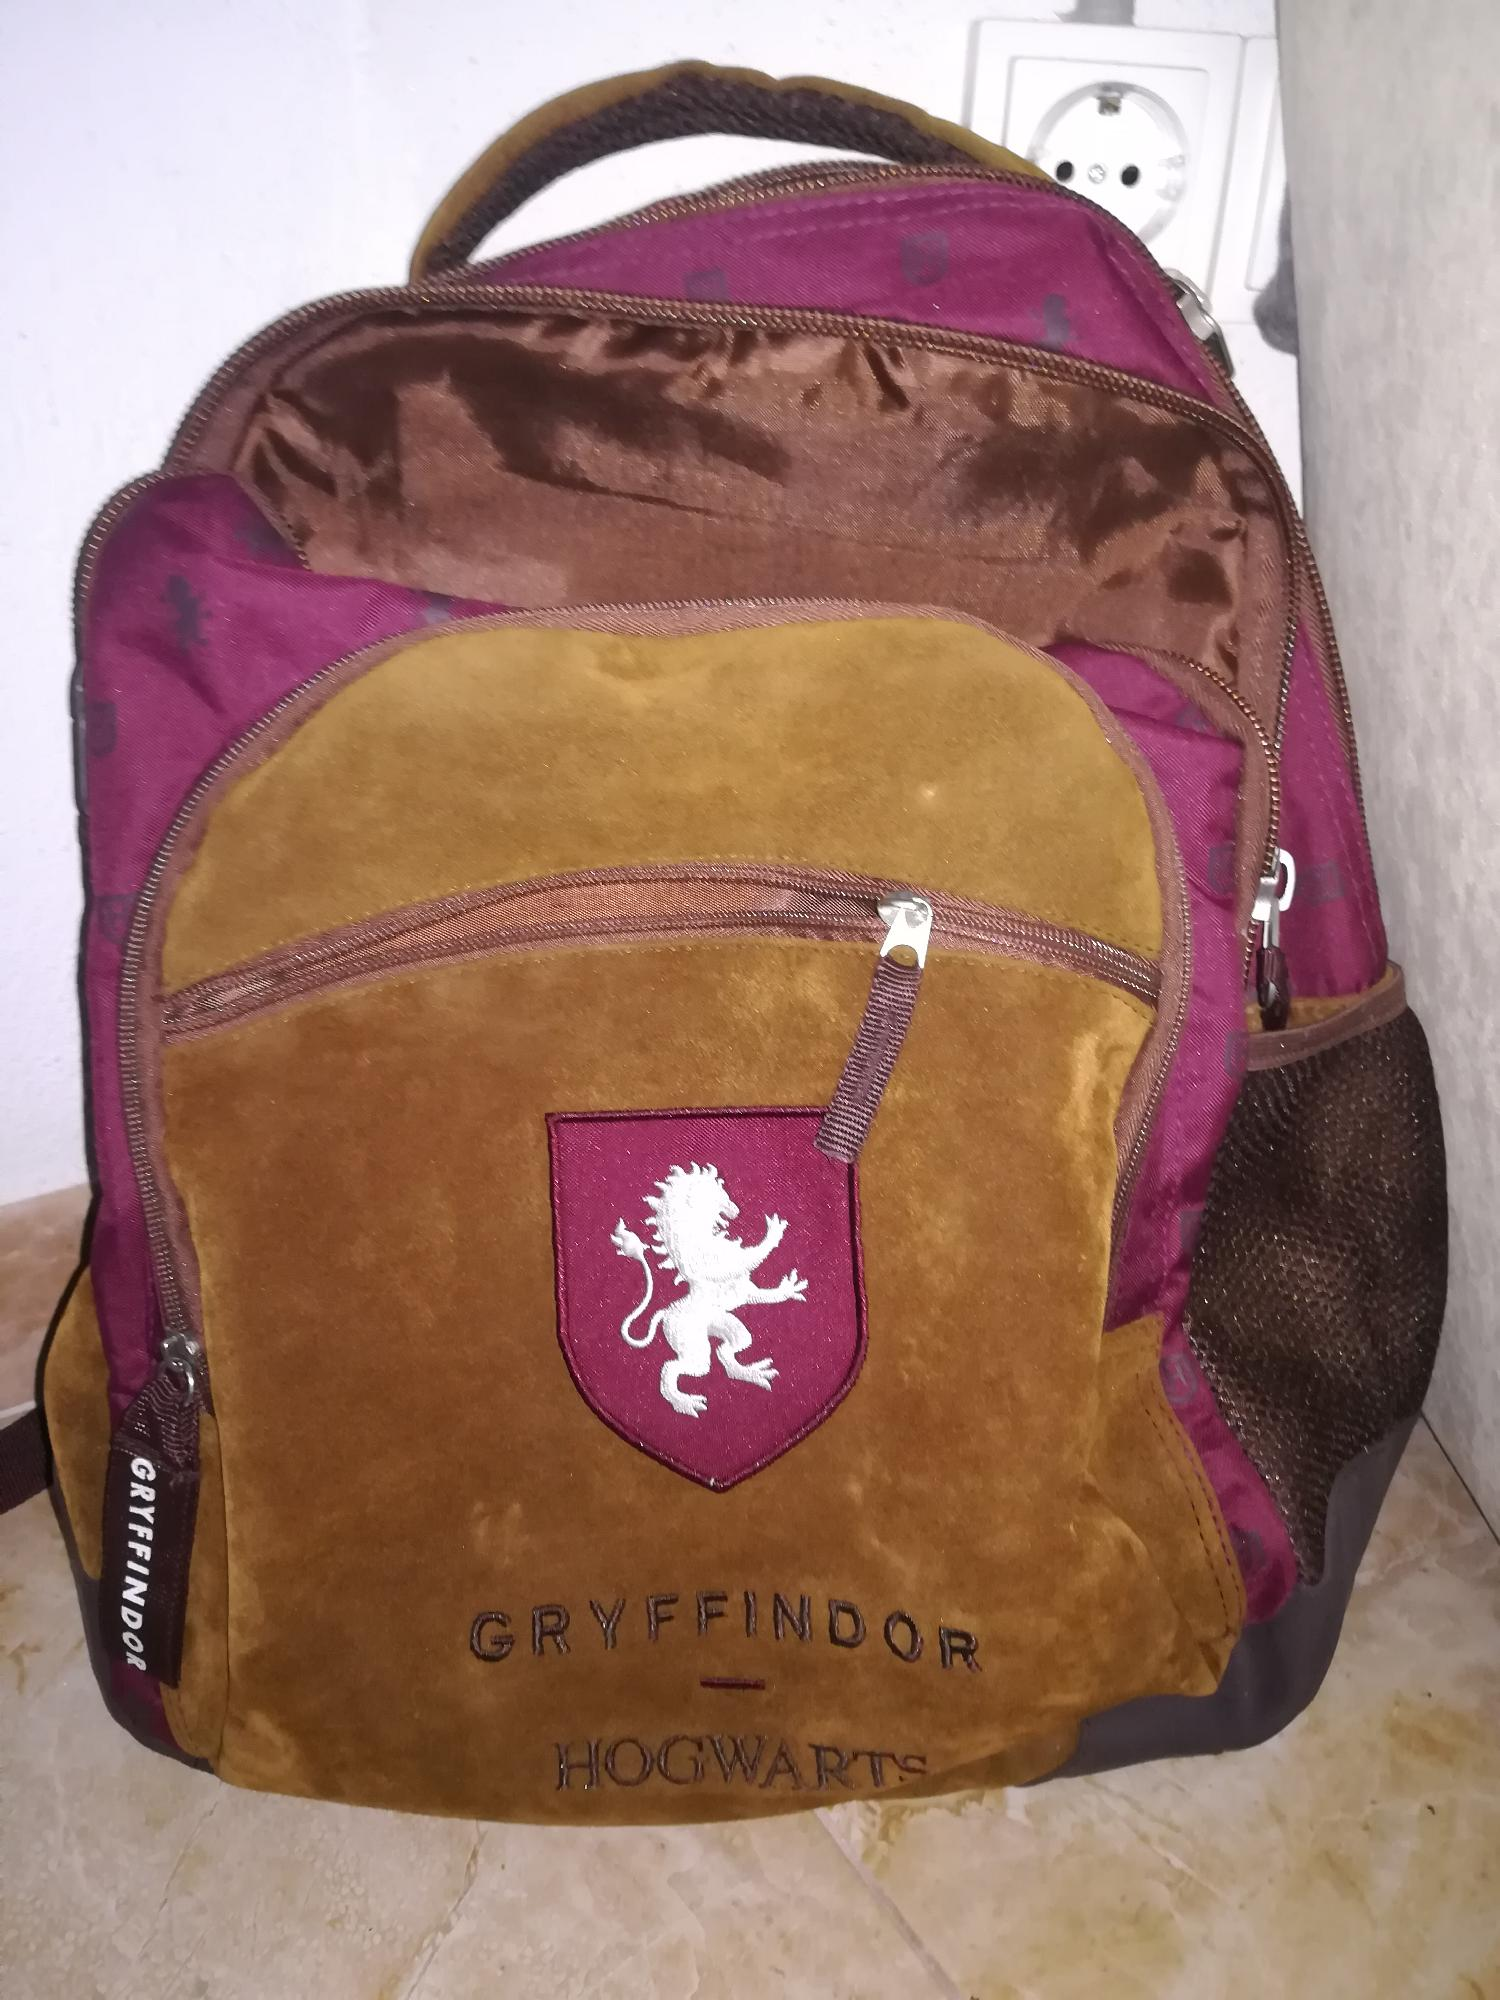 In love con la mochila de este curso 😍